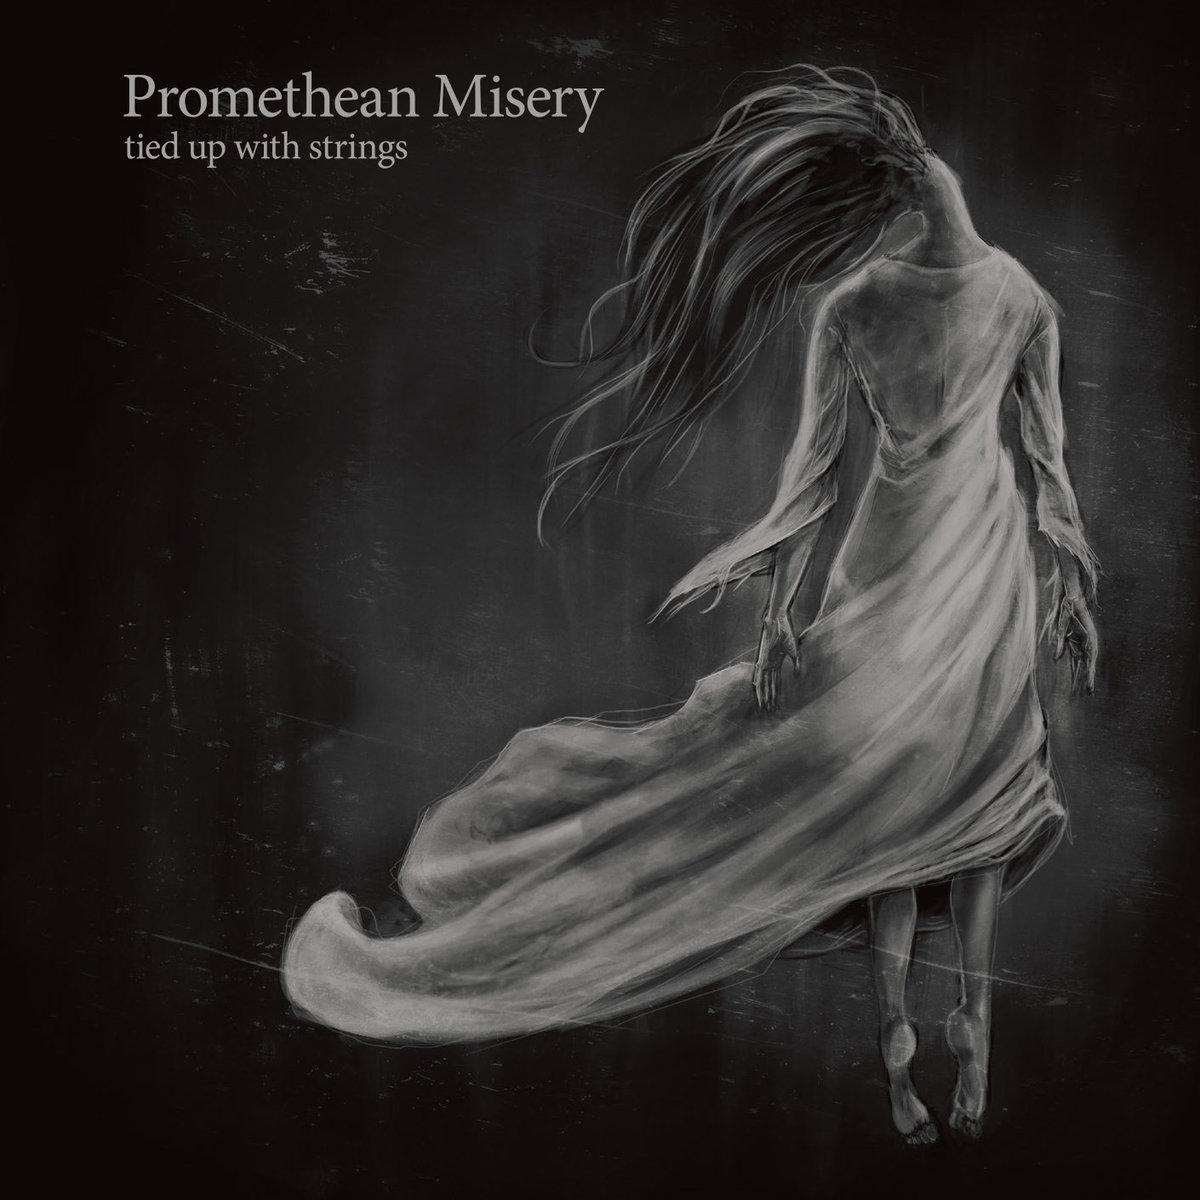 Promethean Misery - funeral doom in d-major